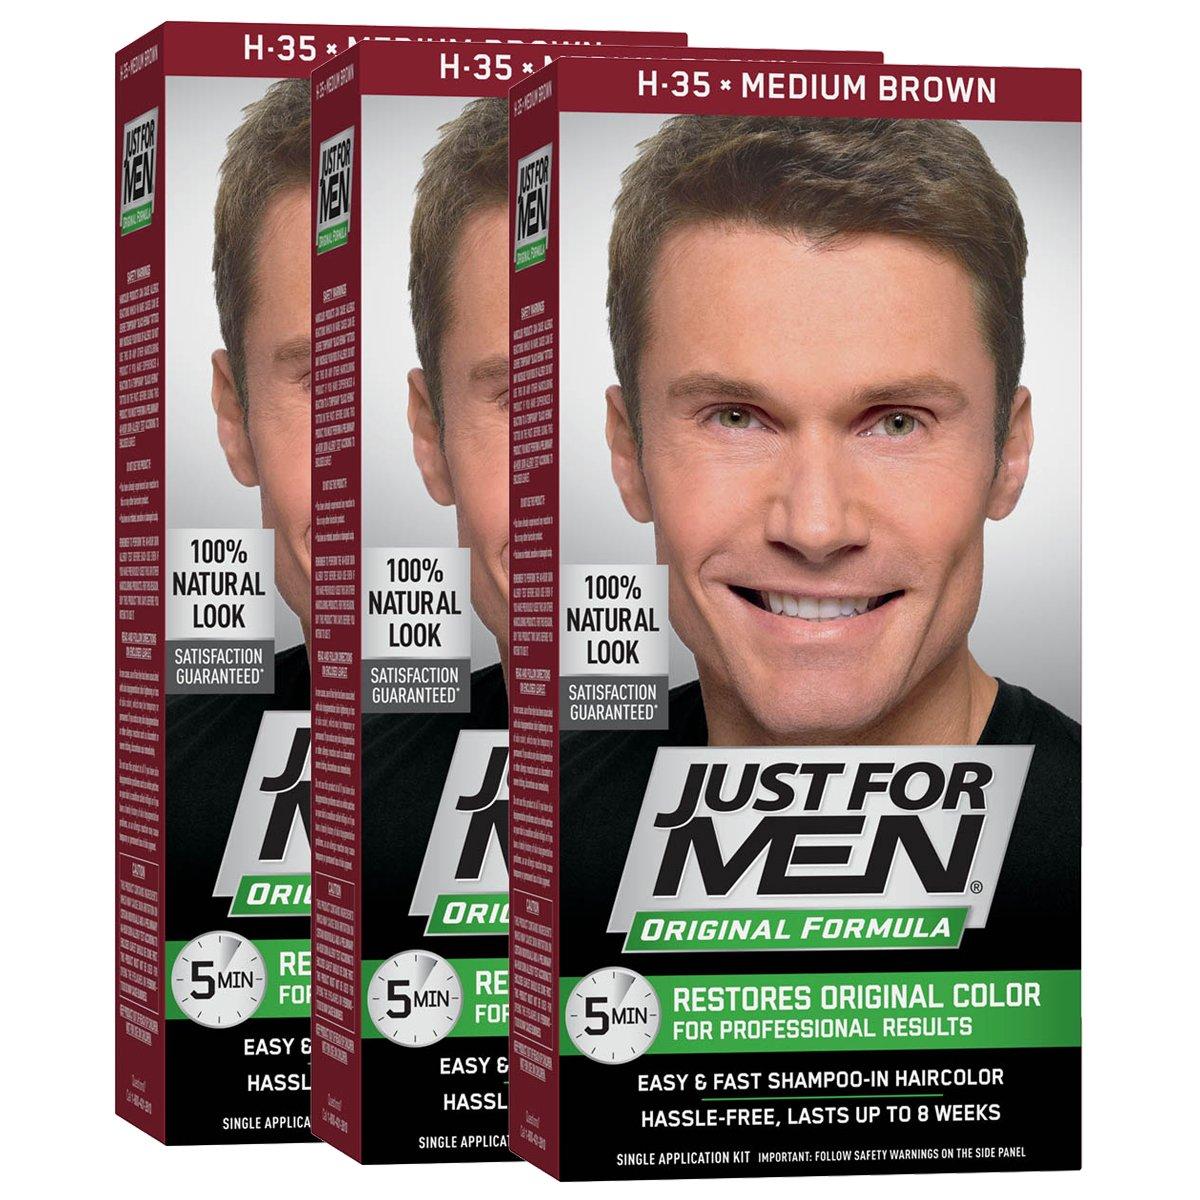 Just For Men Original Formula Men's Hair Color, Medium Brown (Pack of 3) by Just for Men